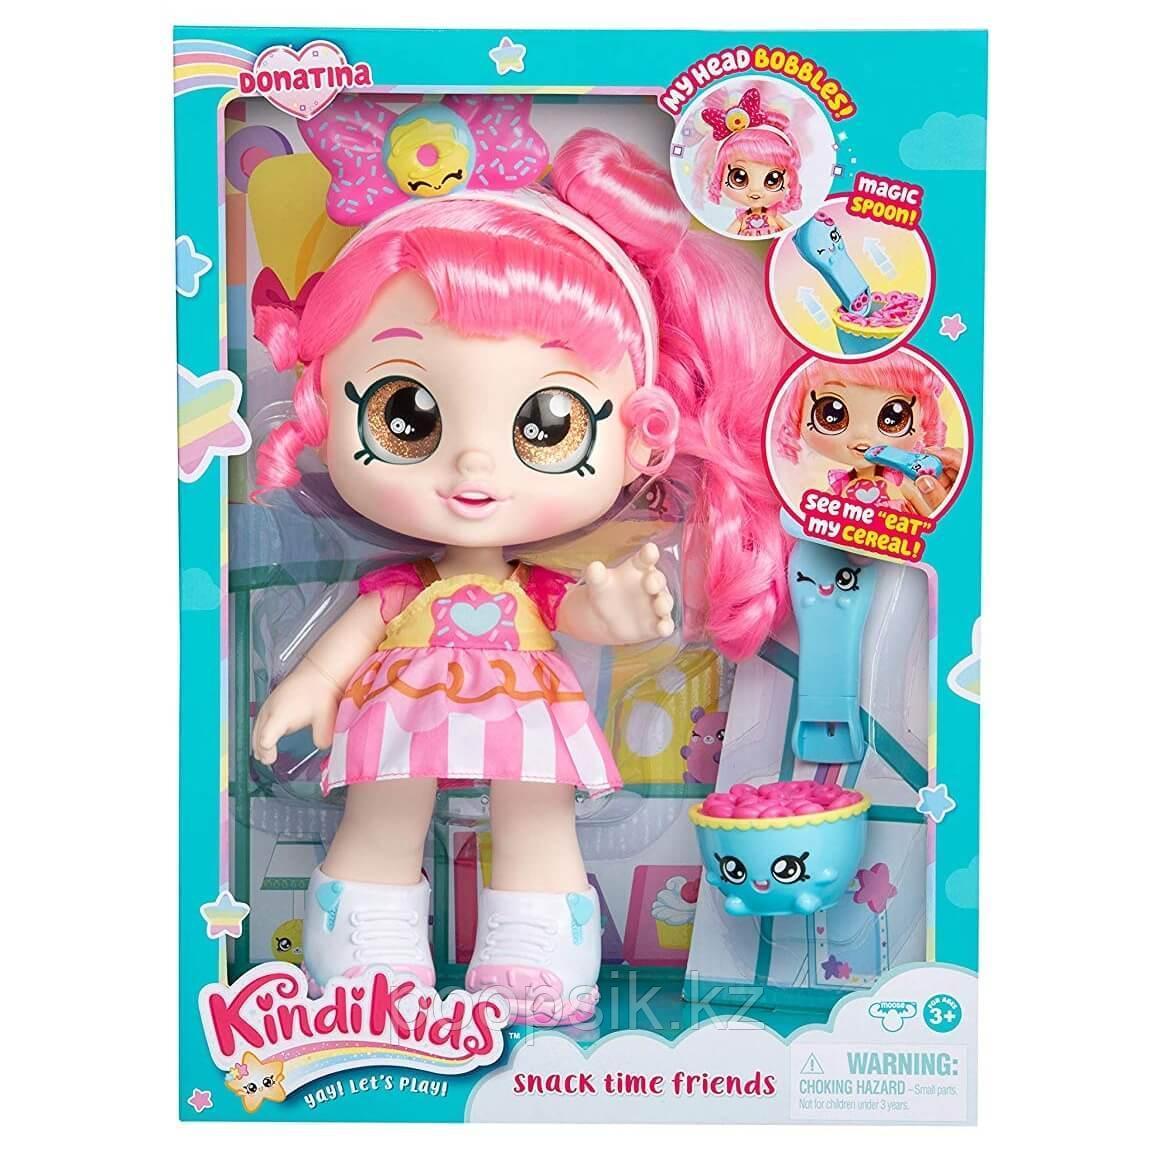 Кукла Кинди Кидс Донатина (Пончик) 25см - фото 3